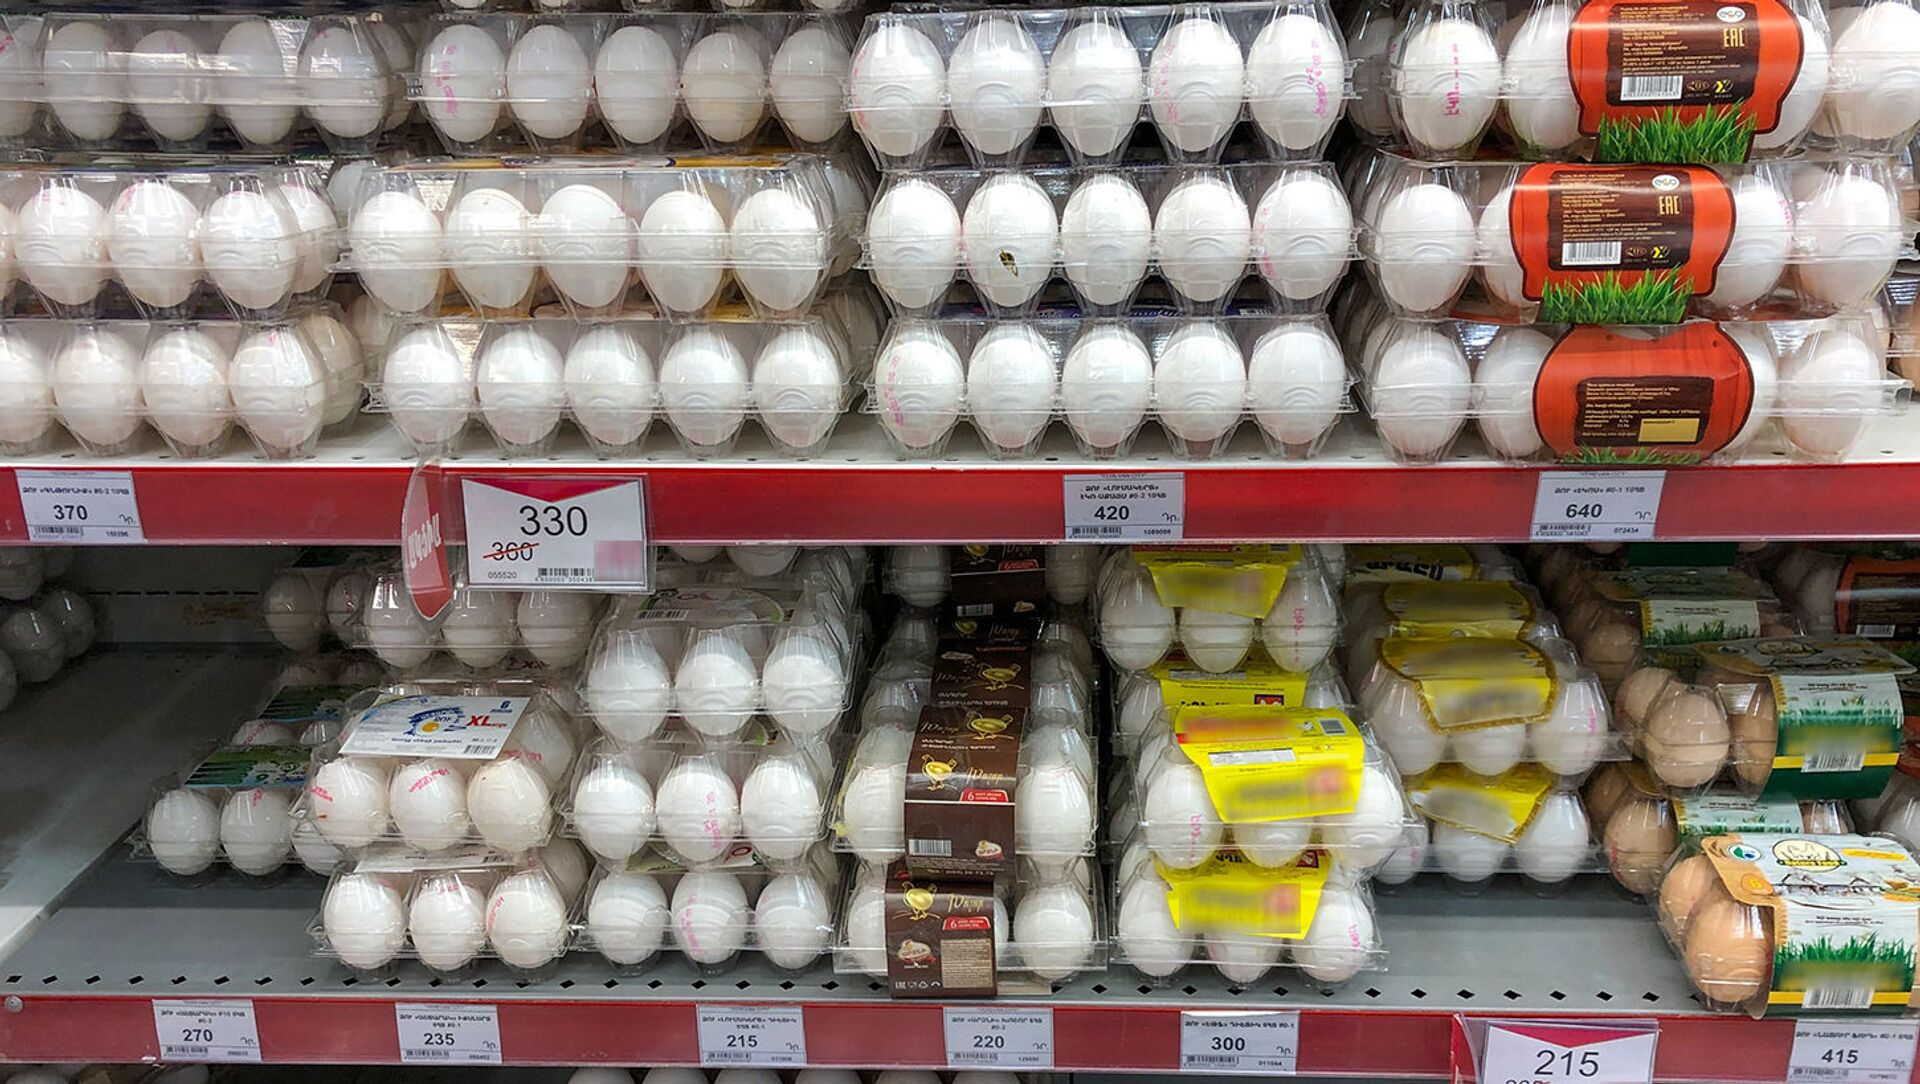 Яйца на прилавках супермаркета - Sputnik Արմենիա, 1920, 09.08.2021